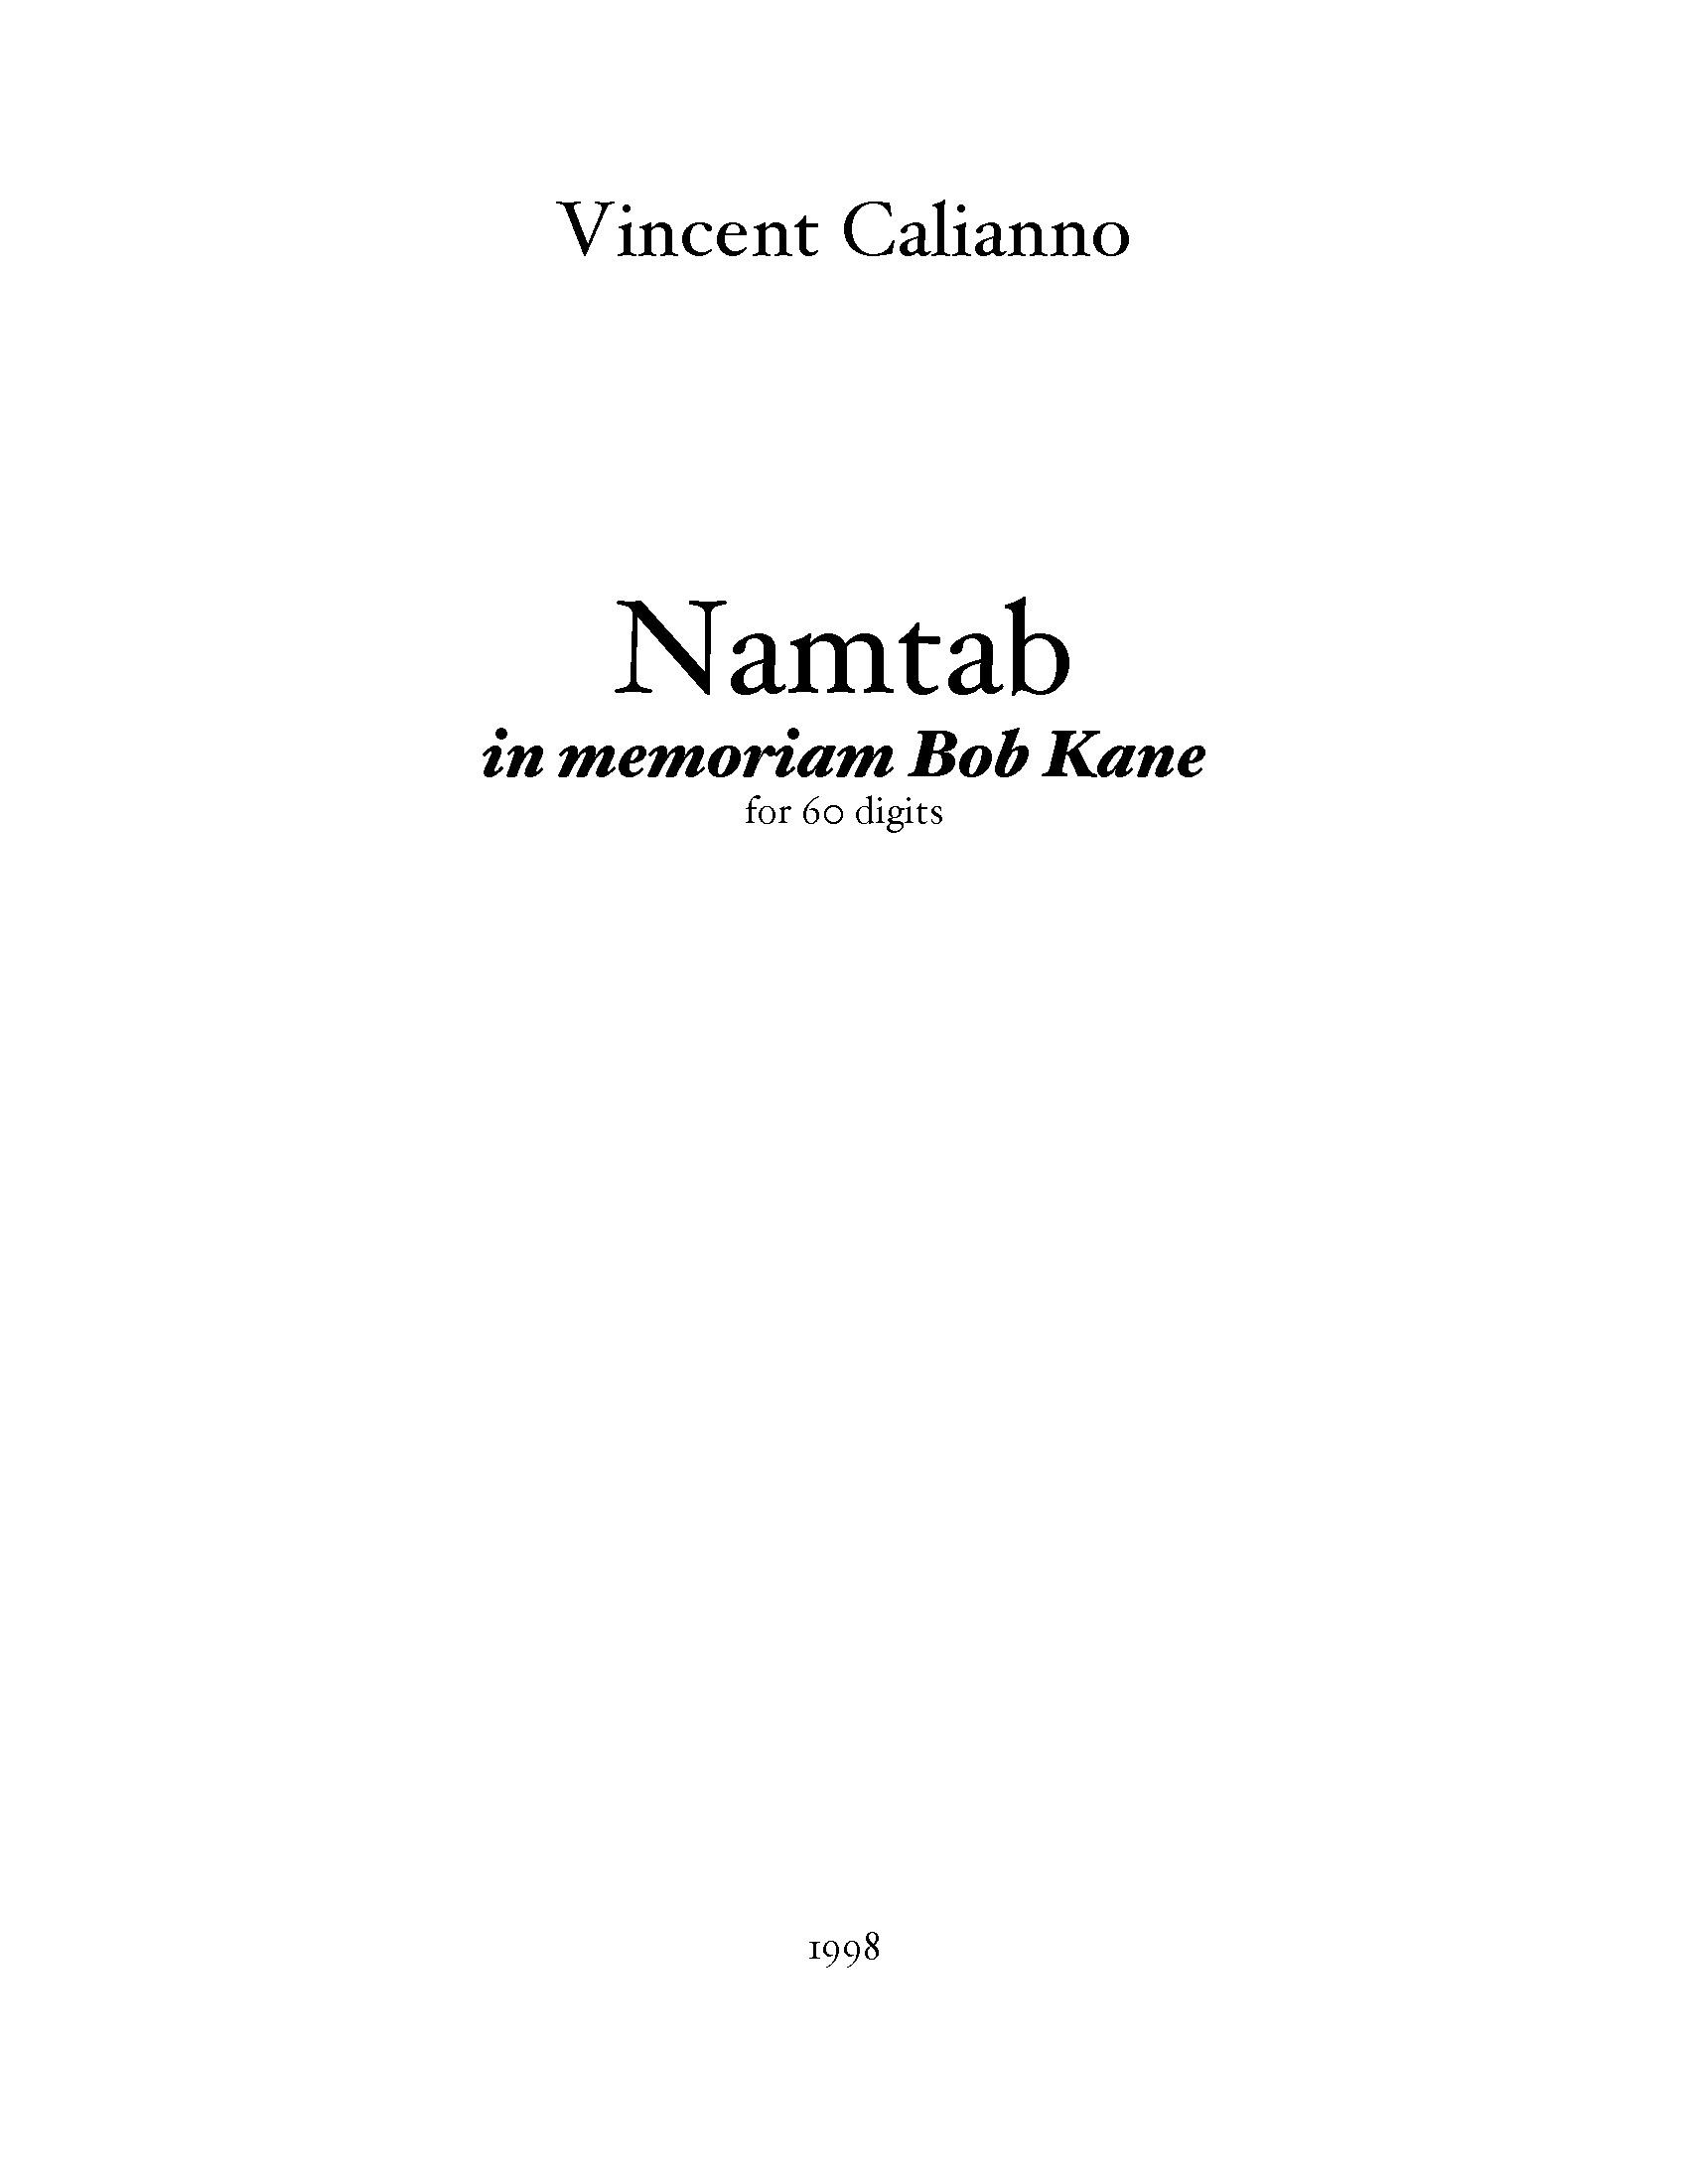 116 - Namtab (in memoriam Bob Kane)_Page_1.jpg